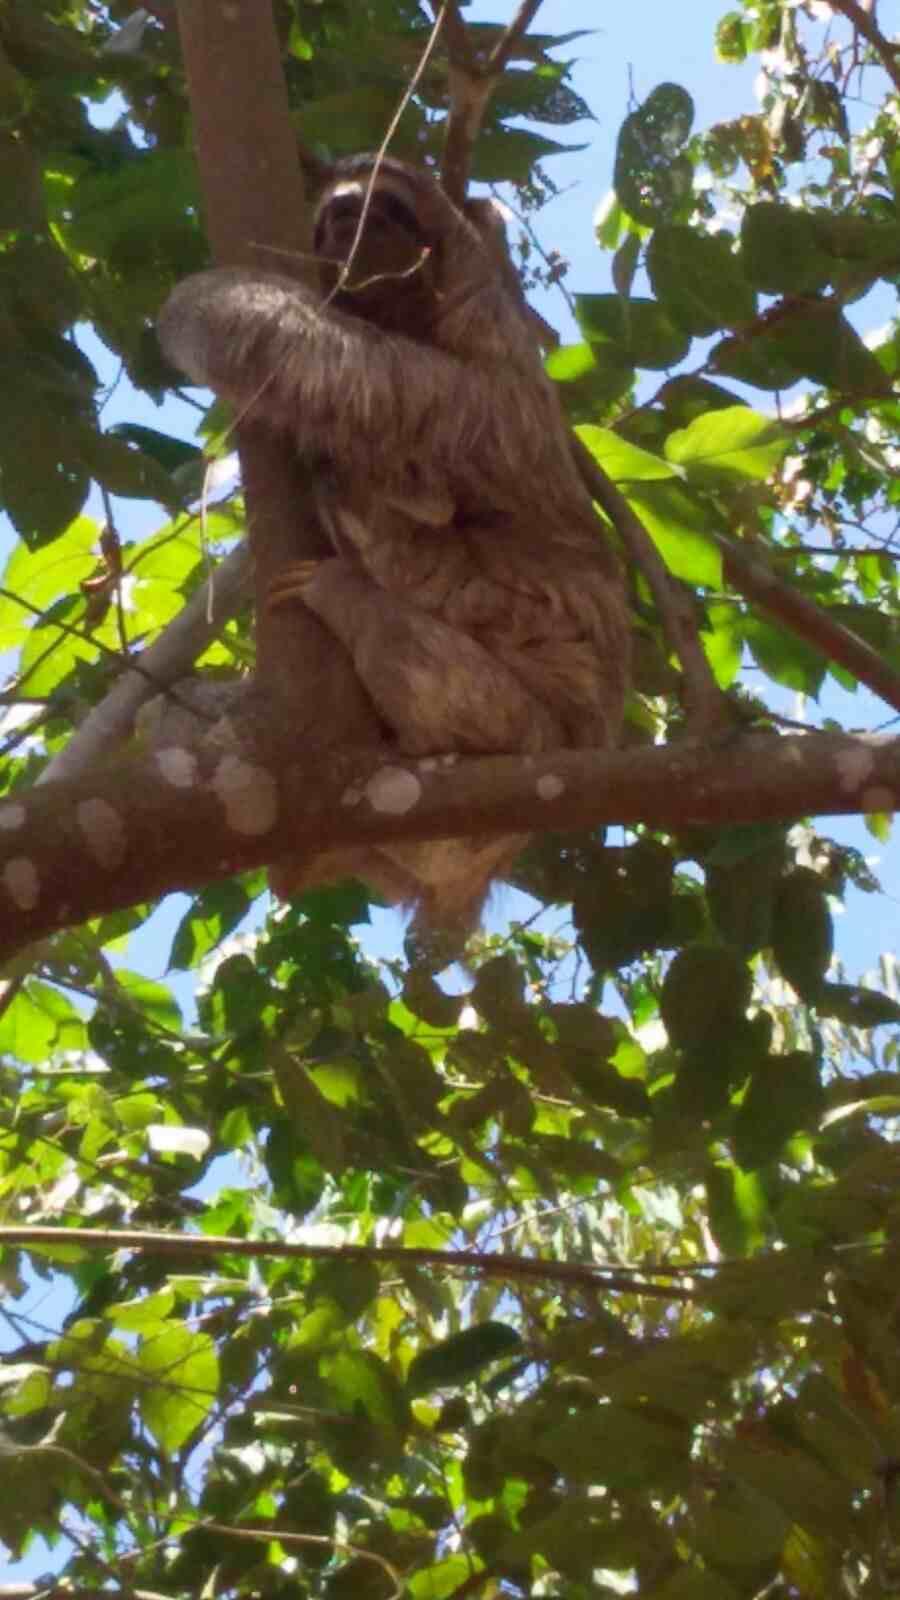 Sloth mama face